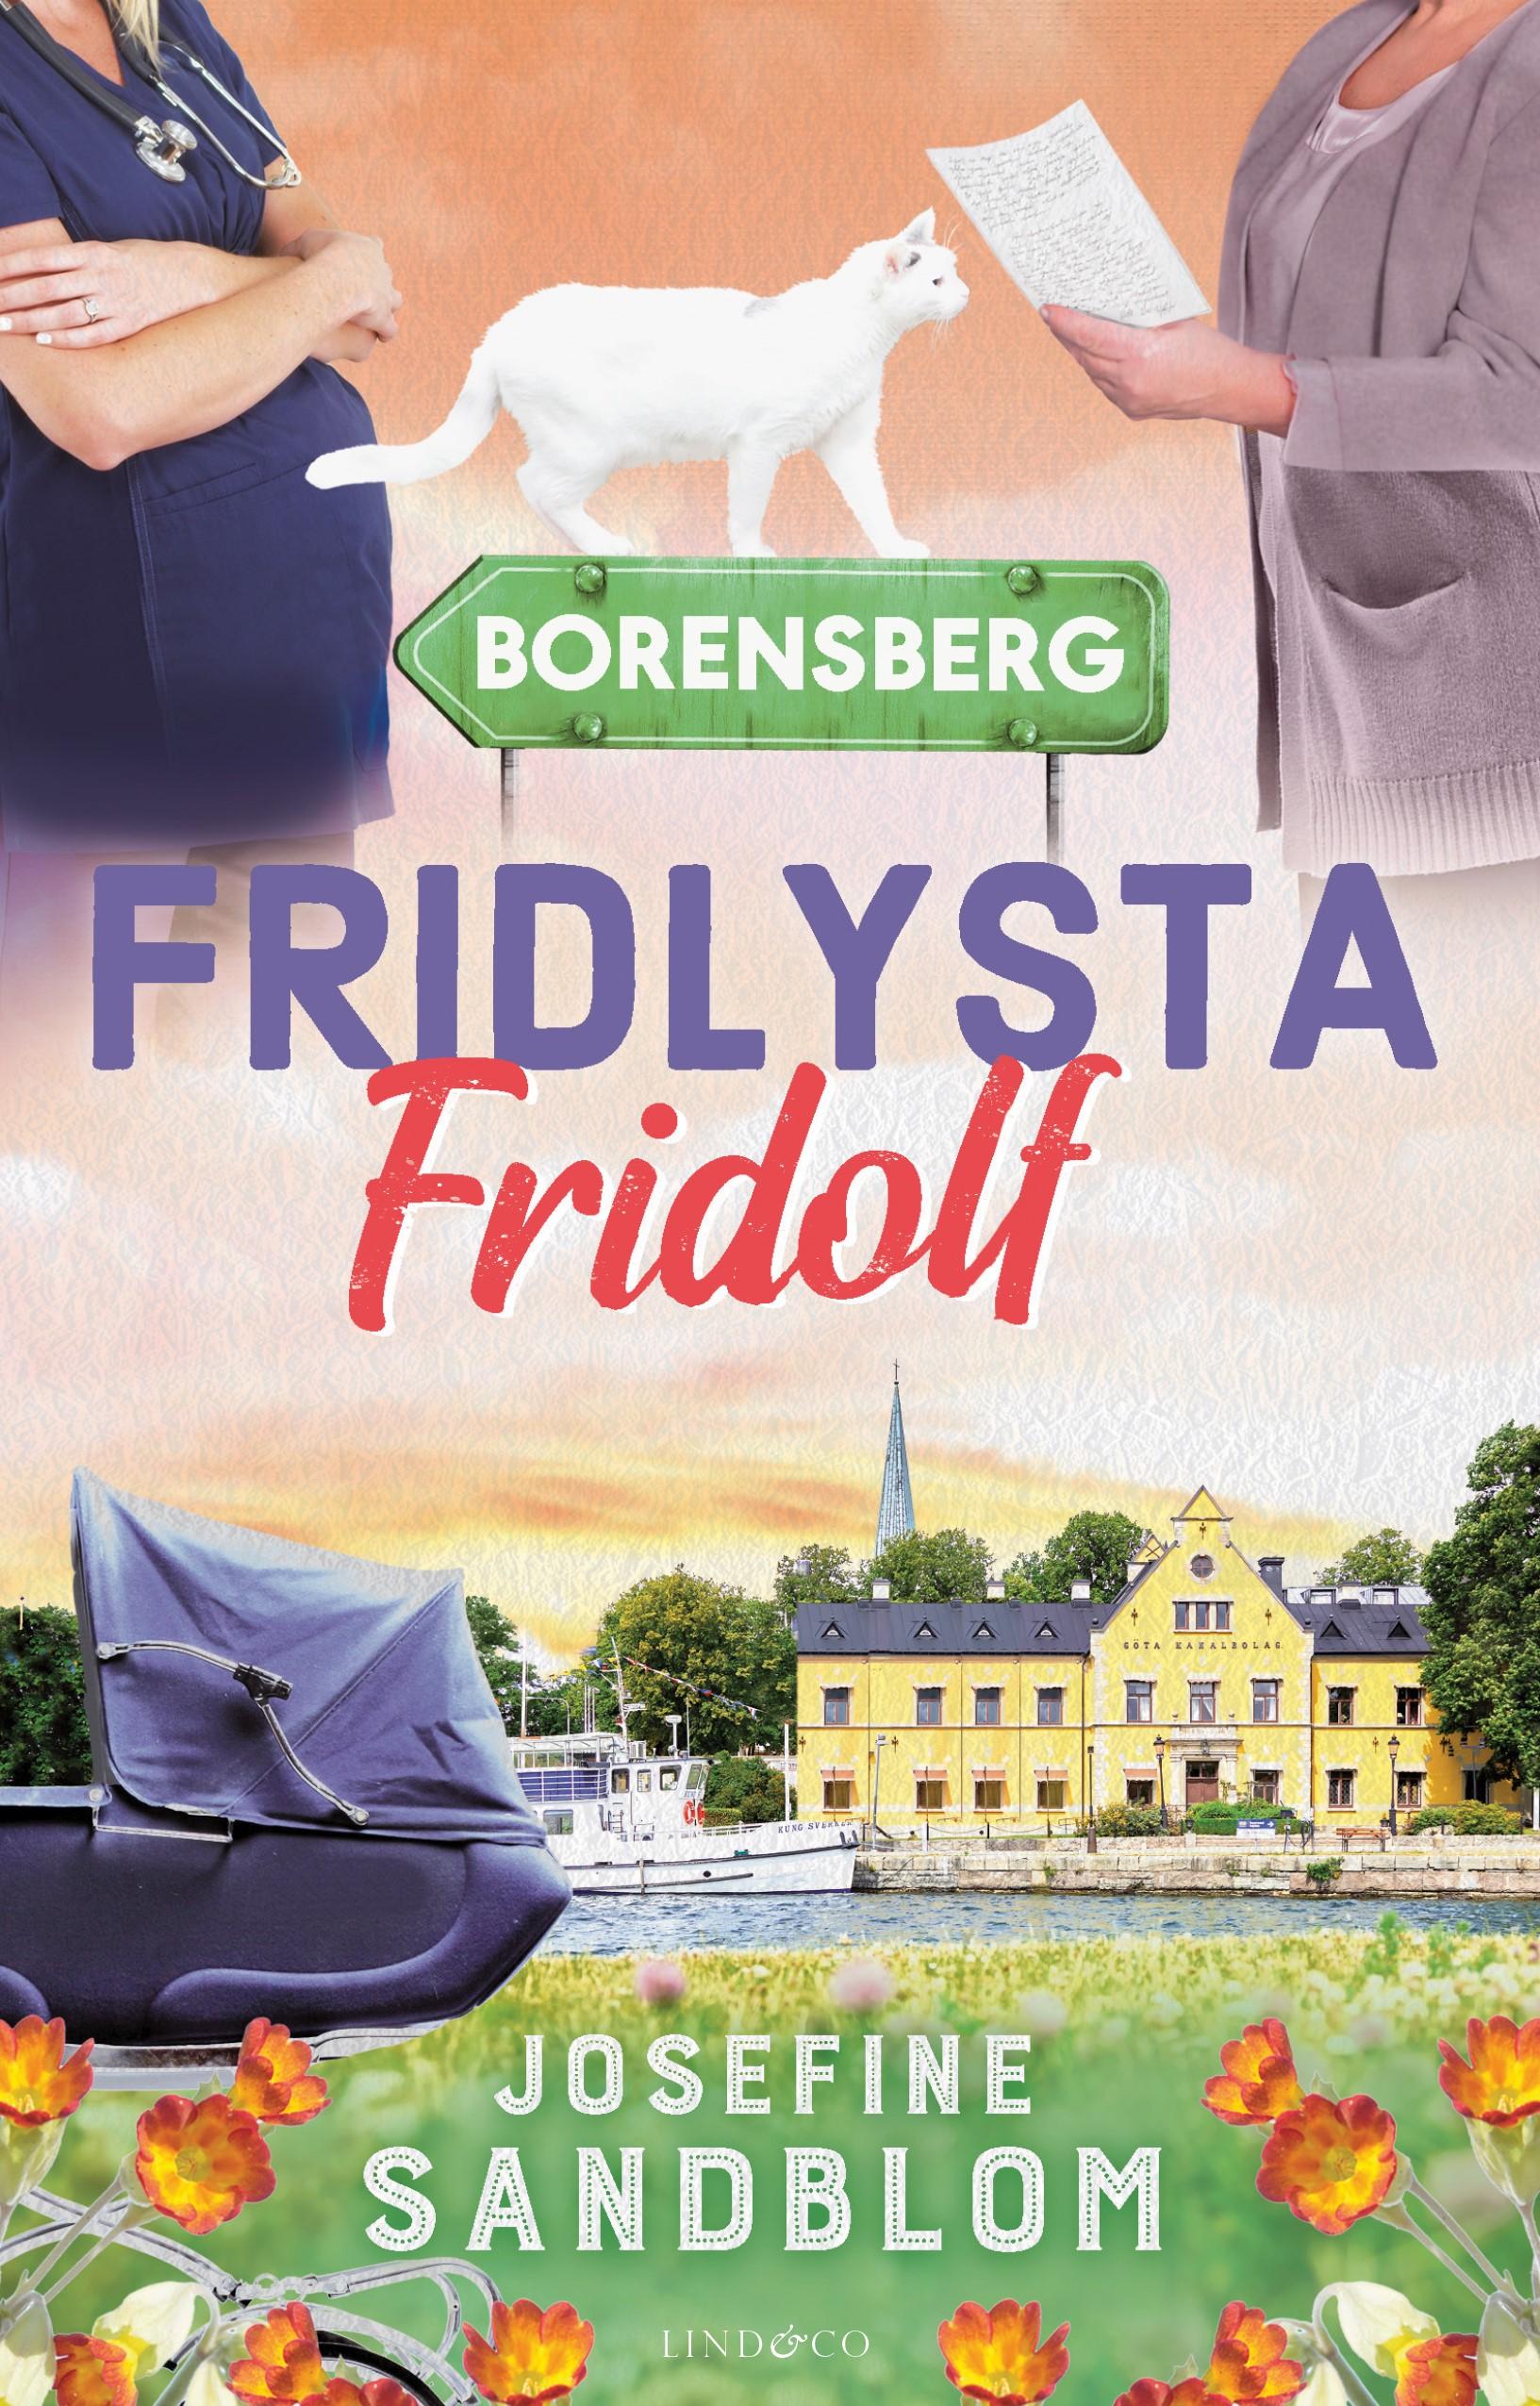 fridlysta_fridolf_josefine_sandblom